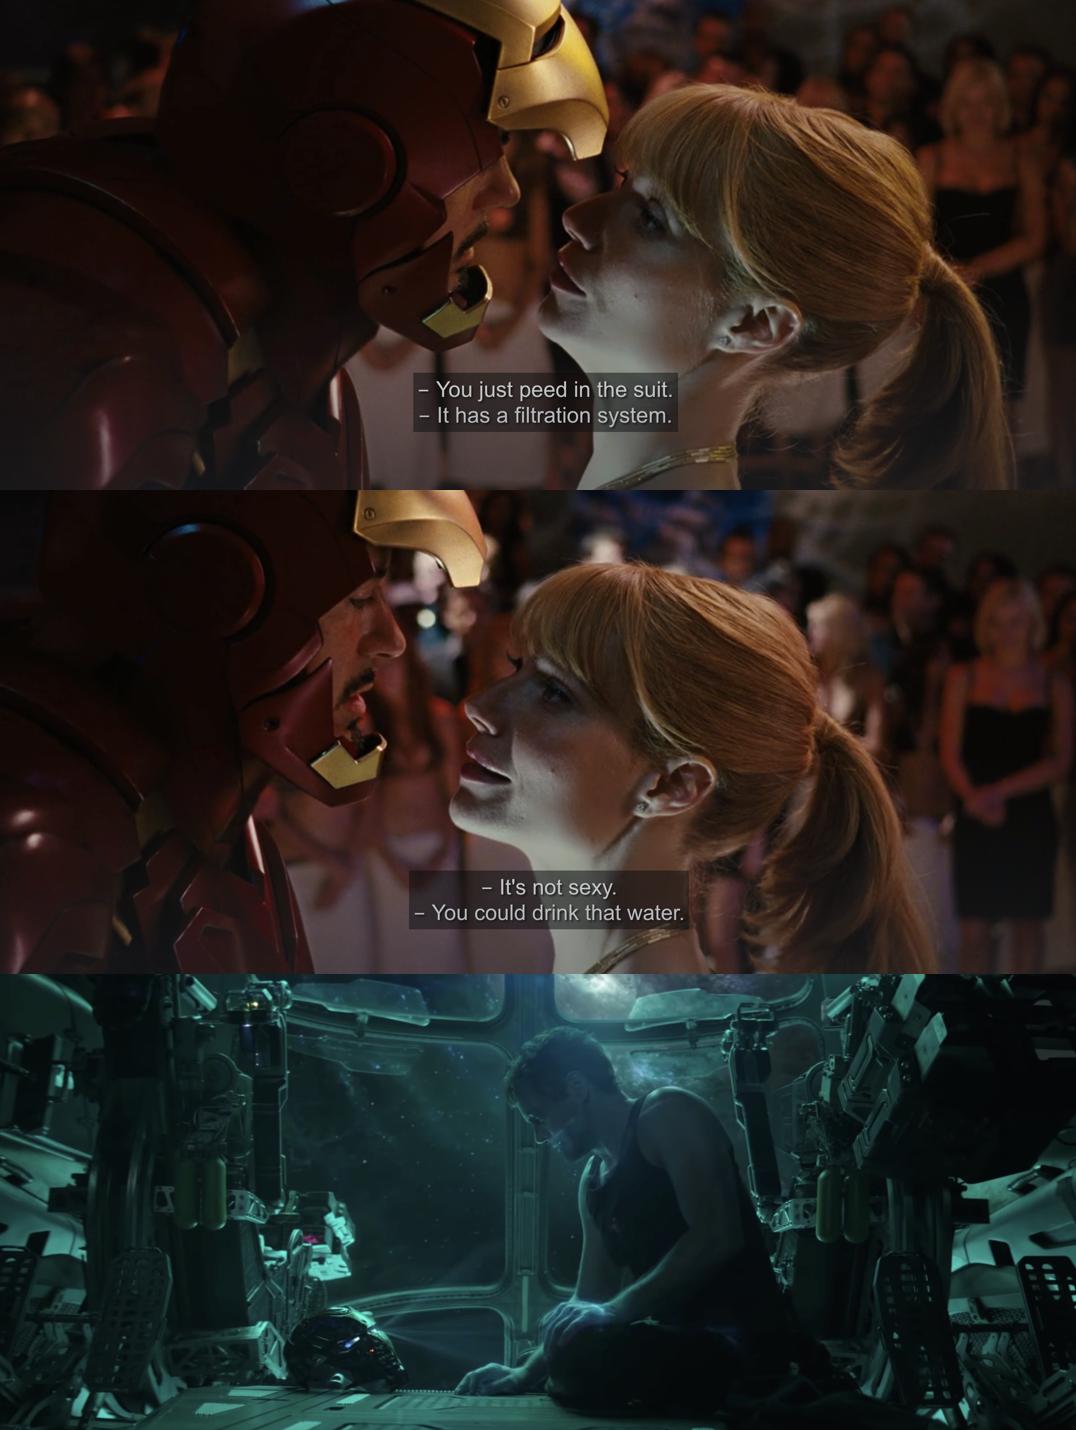 a-fan-spots-an-amusing-avengers-endgame-plot-hole-involving-tony-starks-situation